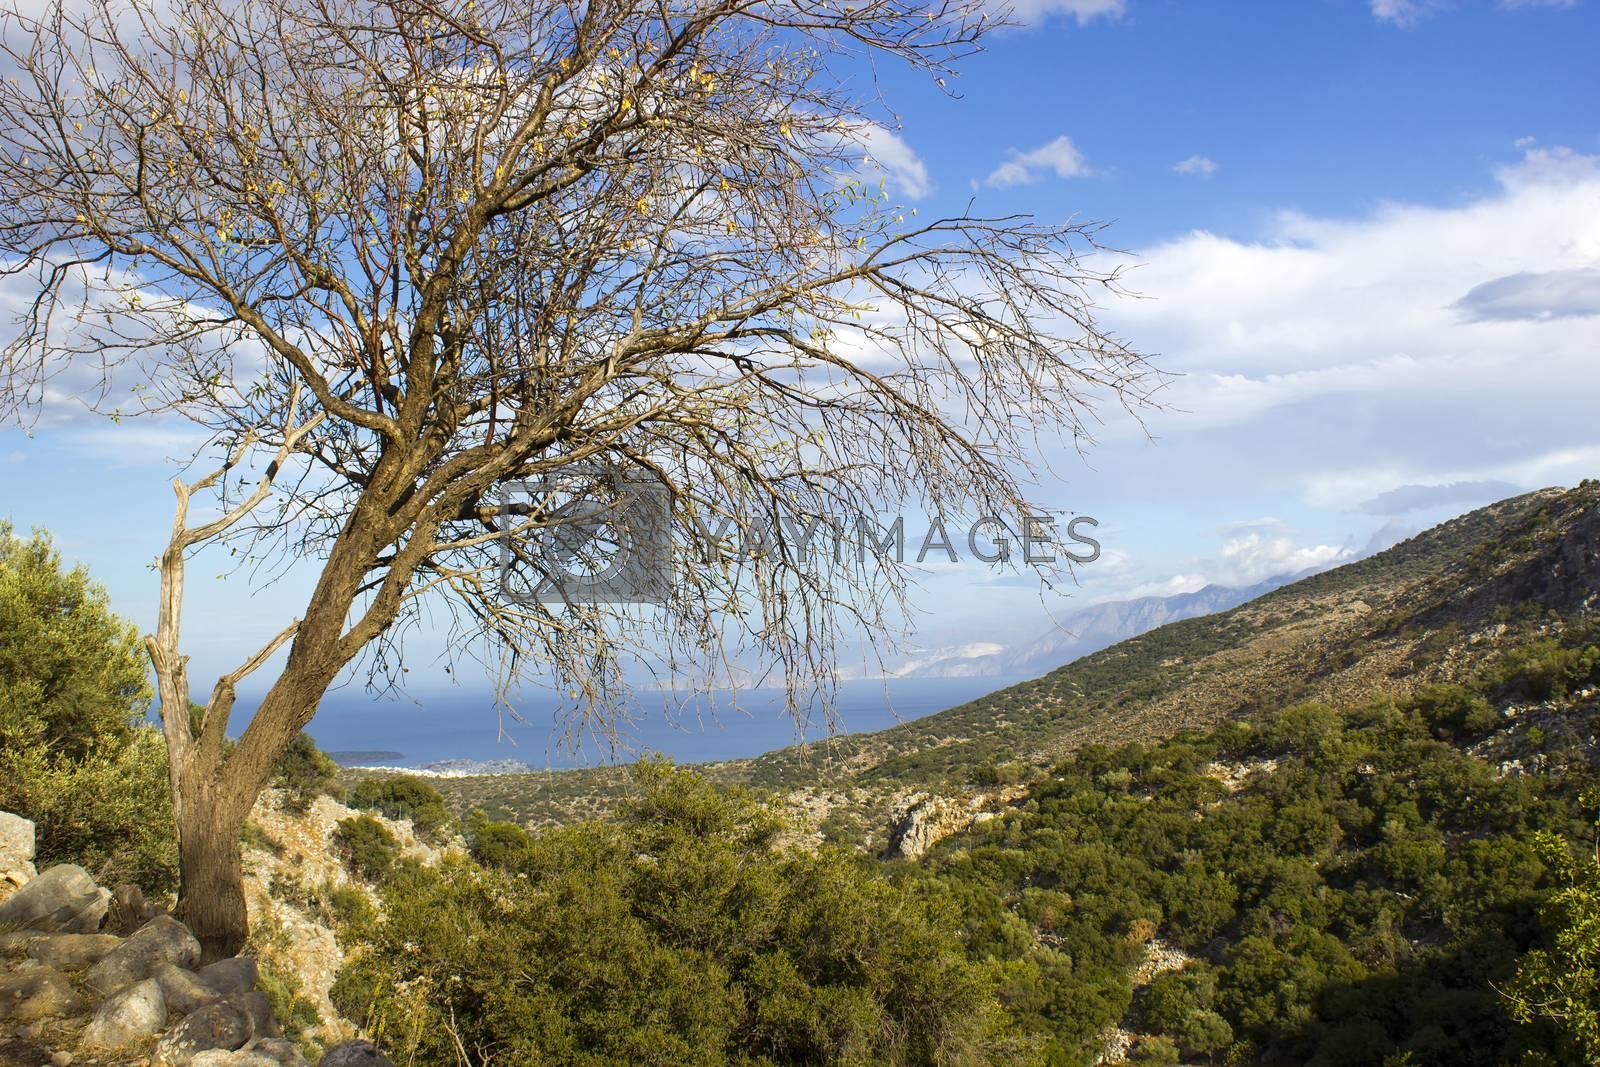 Lato, ancient city on the island of Crete, view of the sea